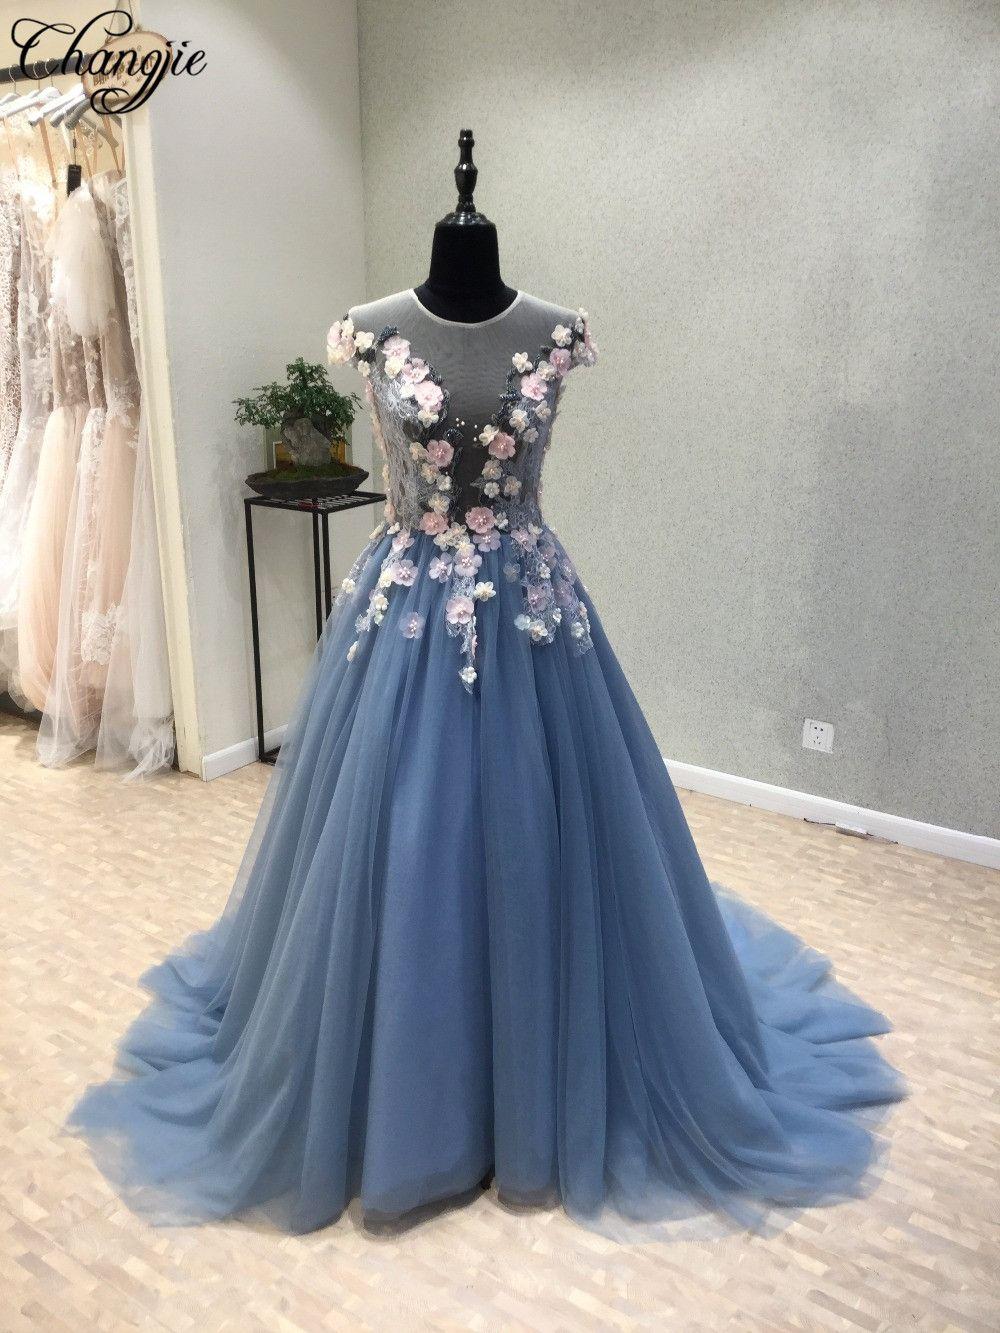 prom dresses long blue prom dresses hand flowers prom dresses